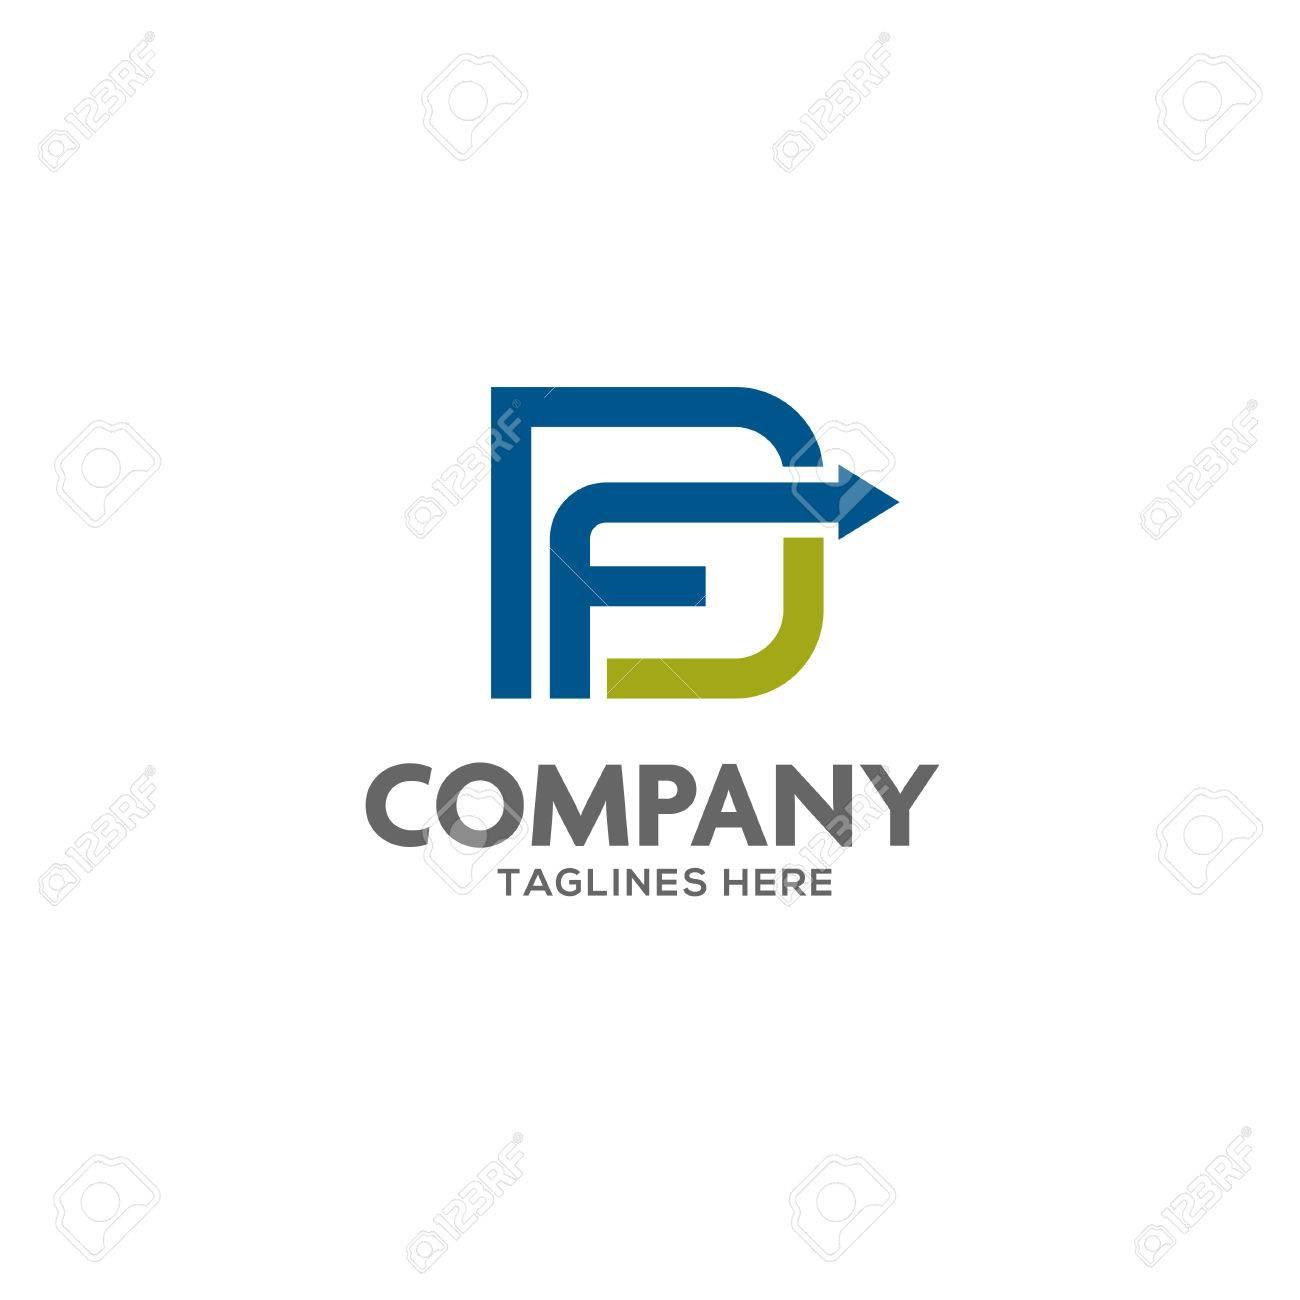 fd letter logo design vector illustration template f letter logo vector letter f and